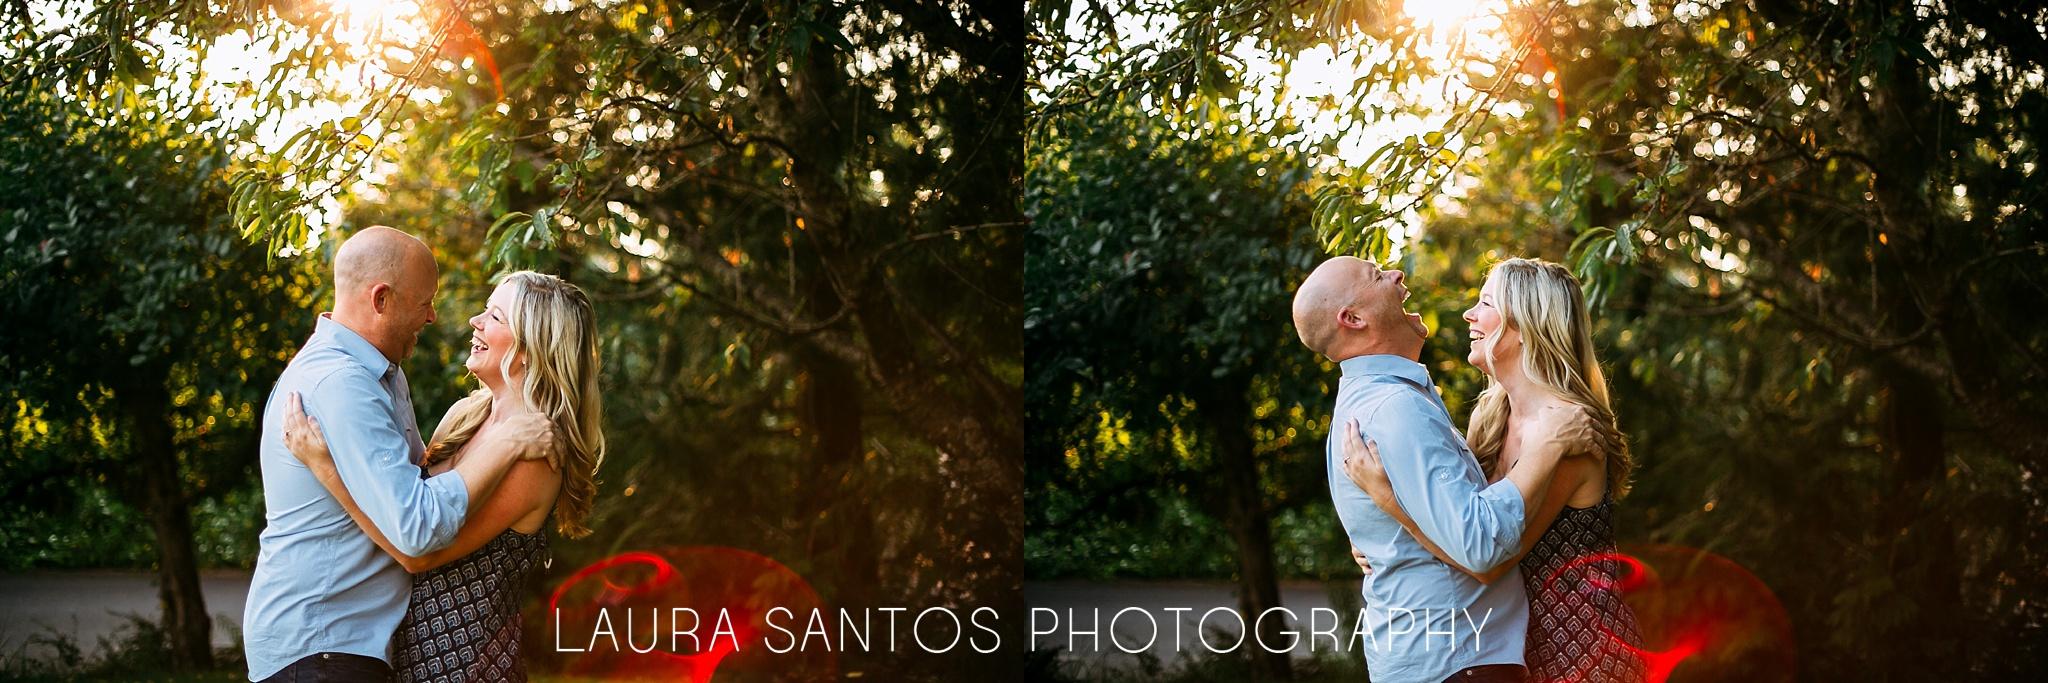 Laura Santos Photography Portland Oregon Family Photographer_0214.jpg